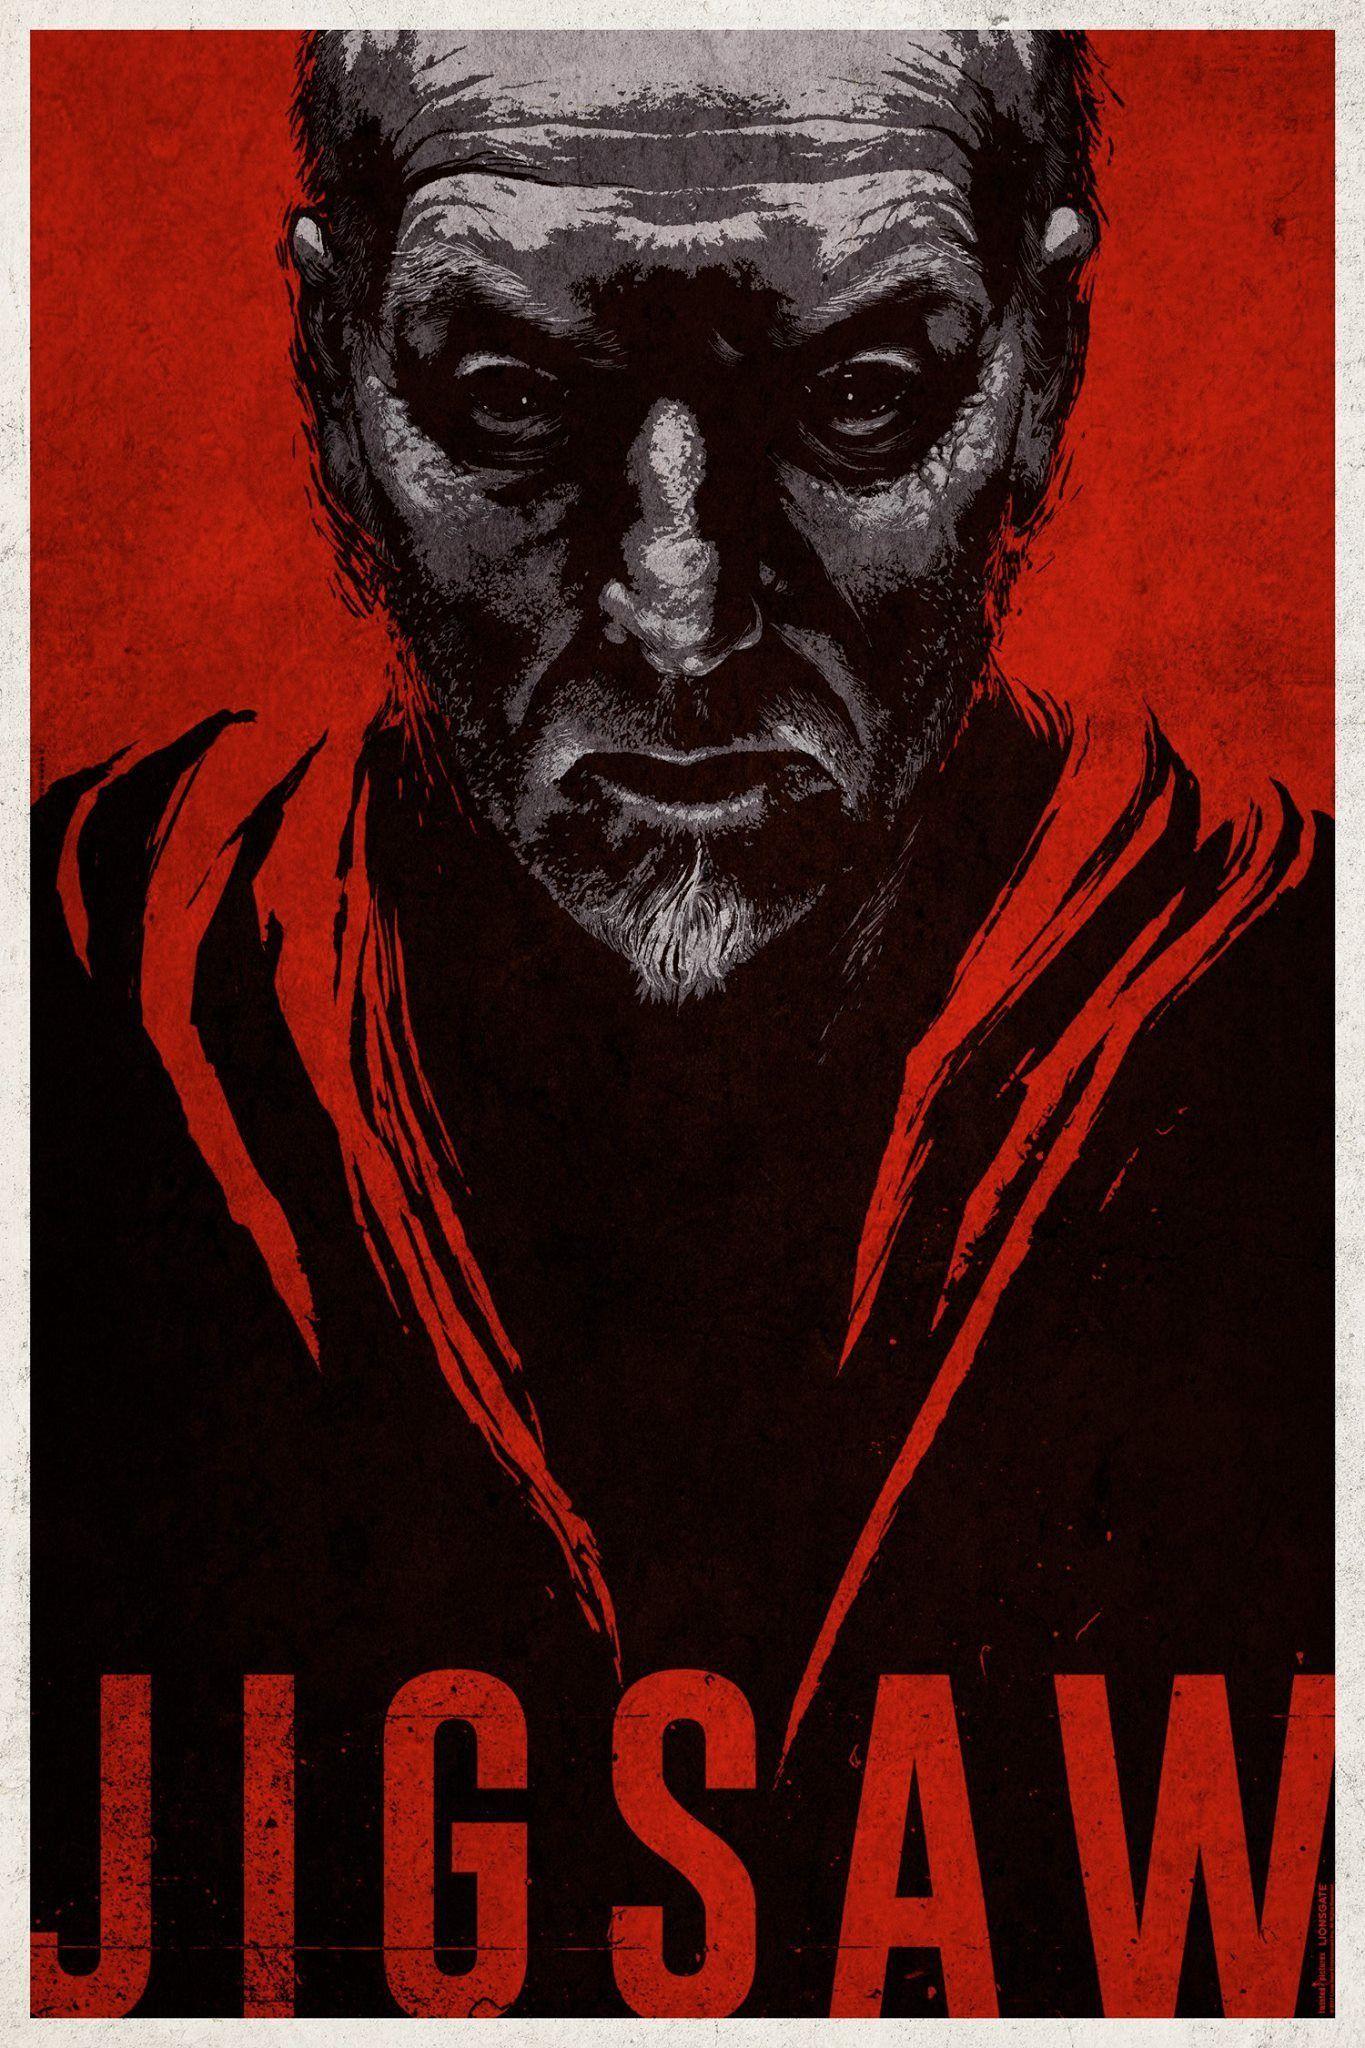 Jigsaw 2017 Hd Wallpaper From Gallsourcecom Horror Business